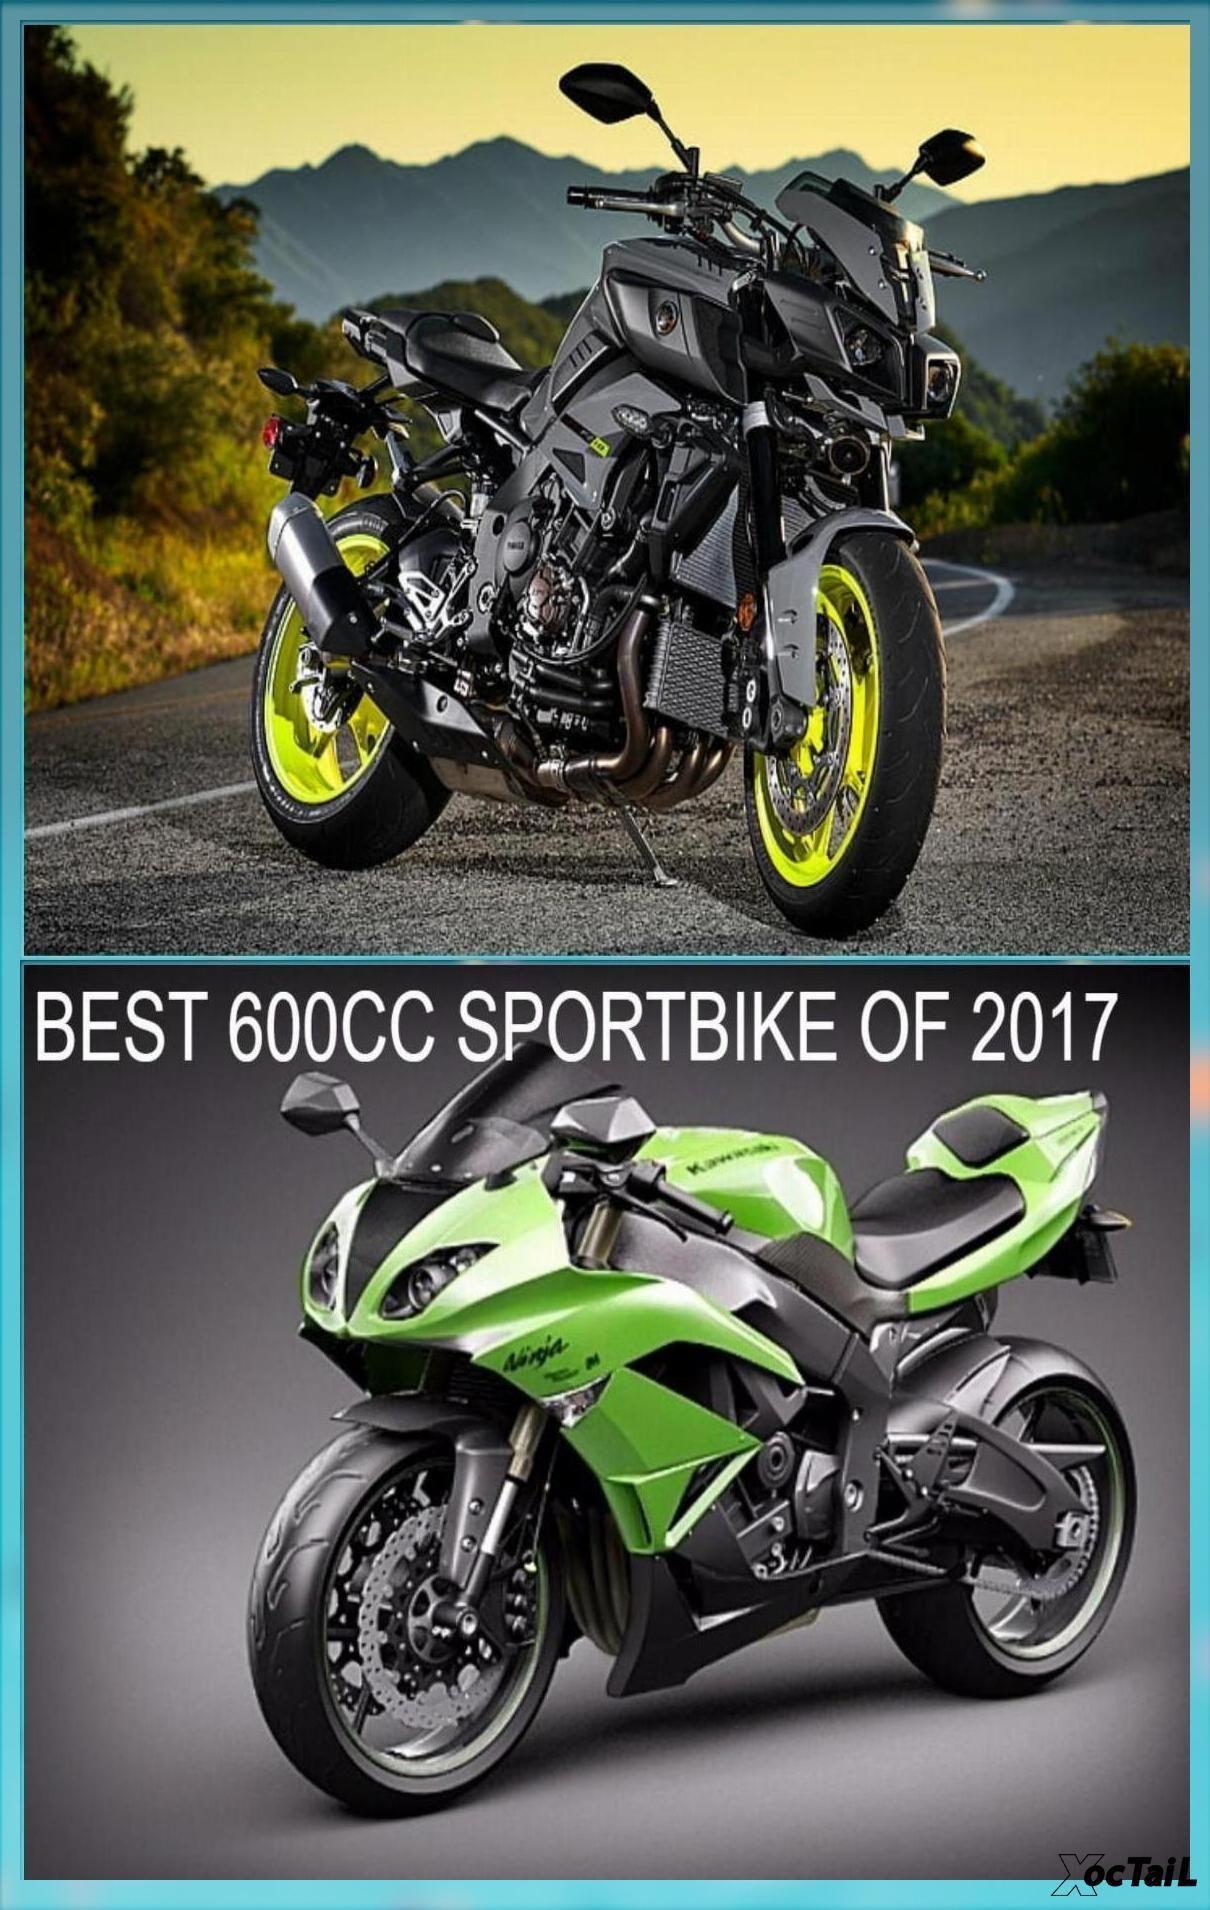 Hd Wallpaper Yamaha Fz 10 2017 Bikes Sportbikes 600cc Sportbikes Motorcycl Trend Sportbikes Yamaha Fz Custom Sportbikes